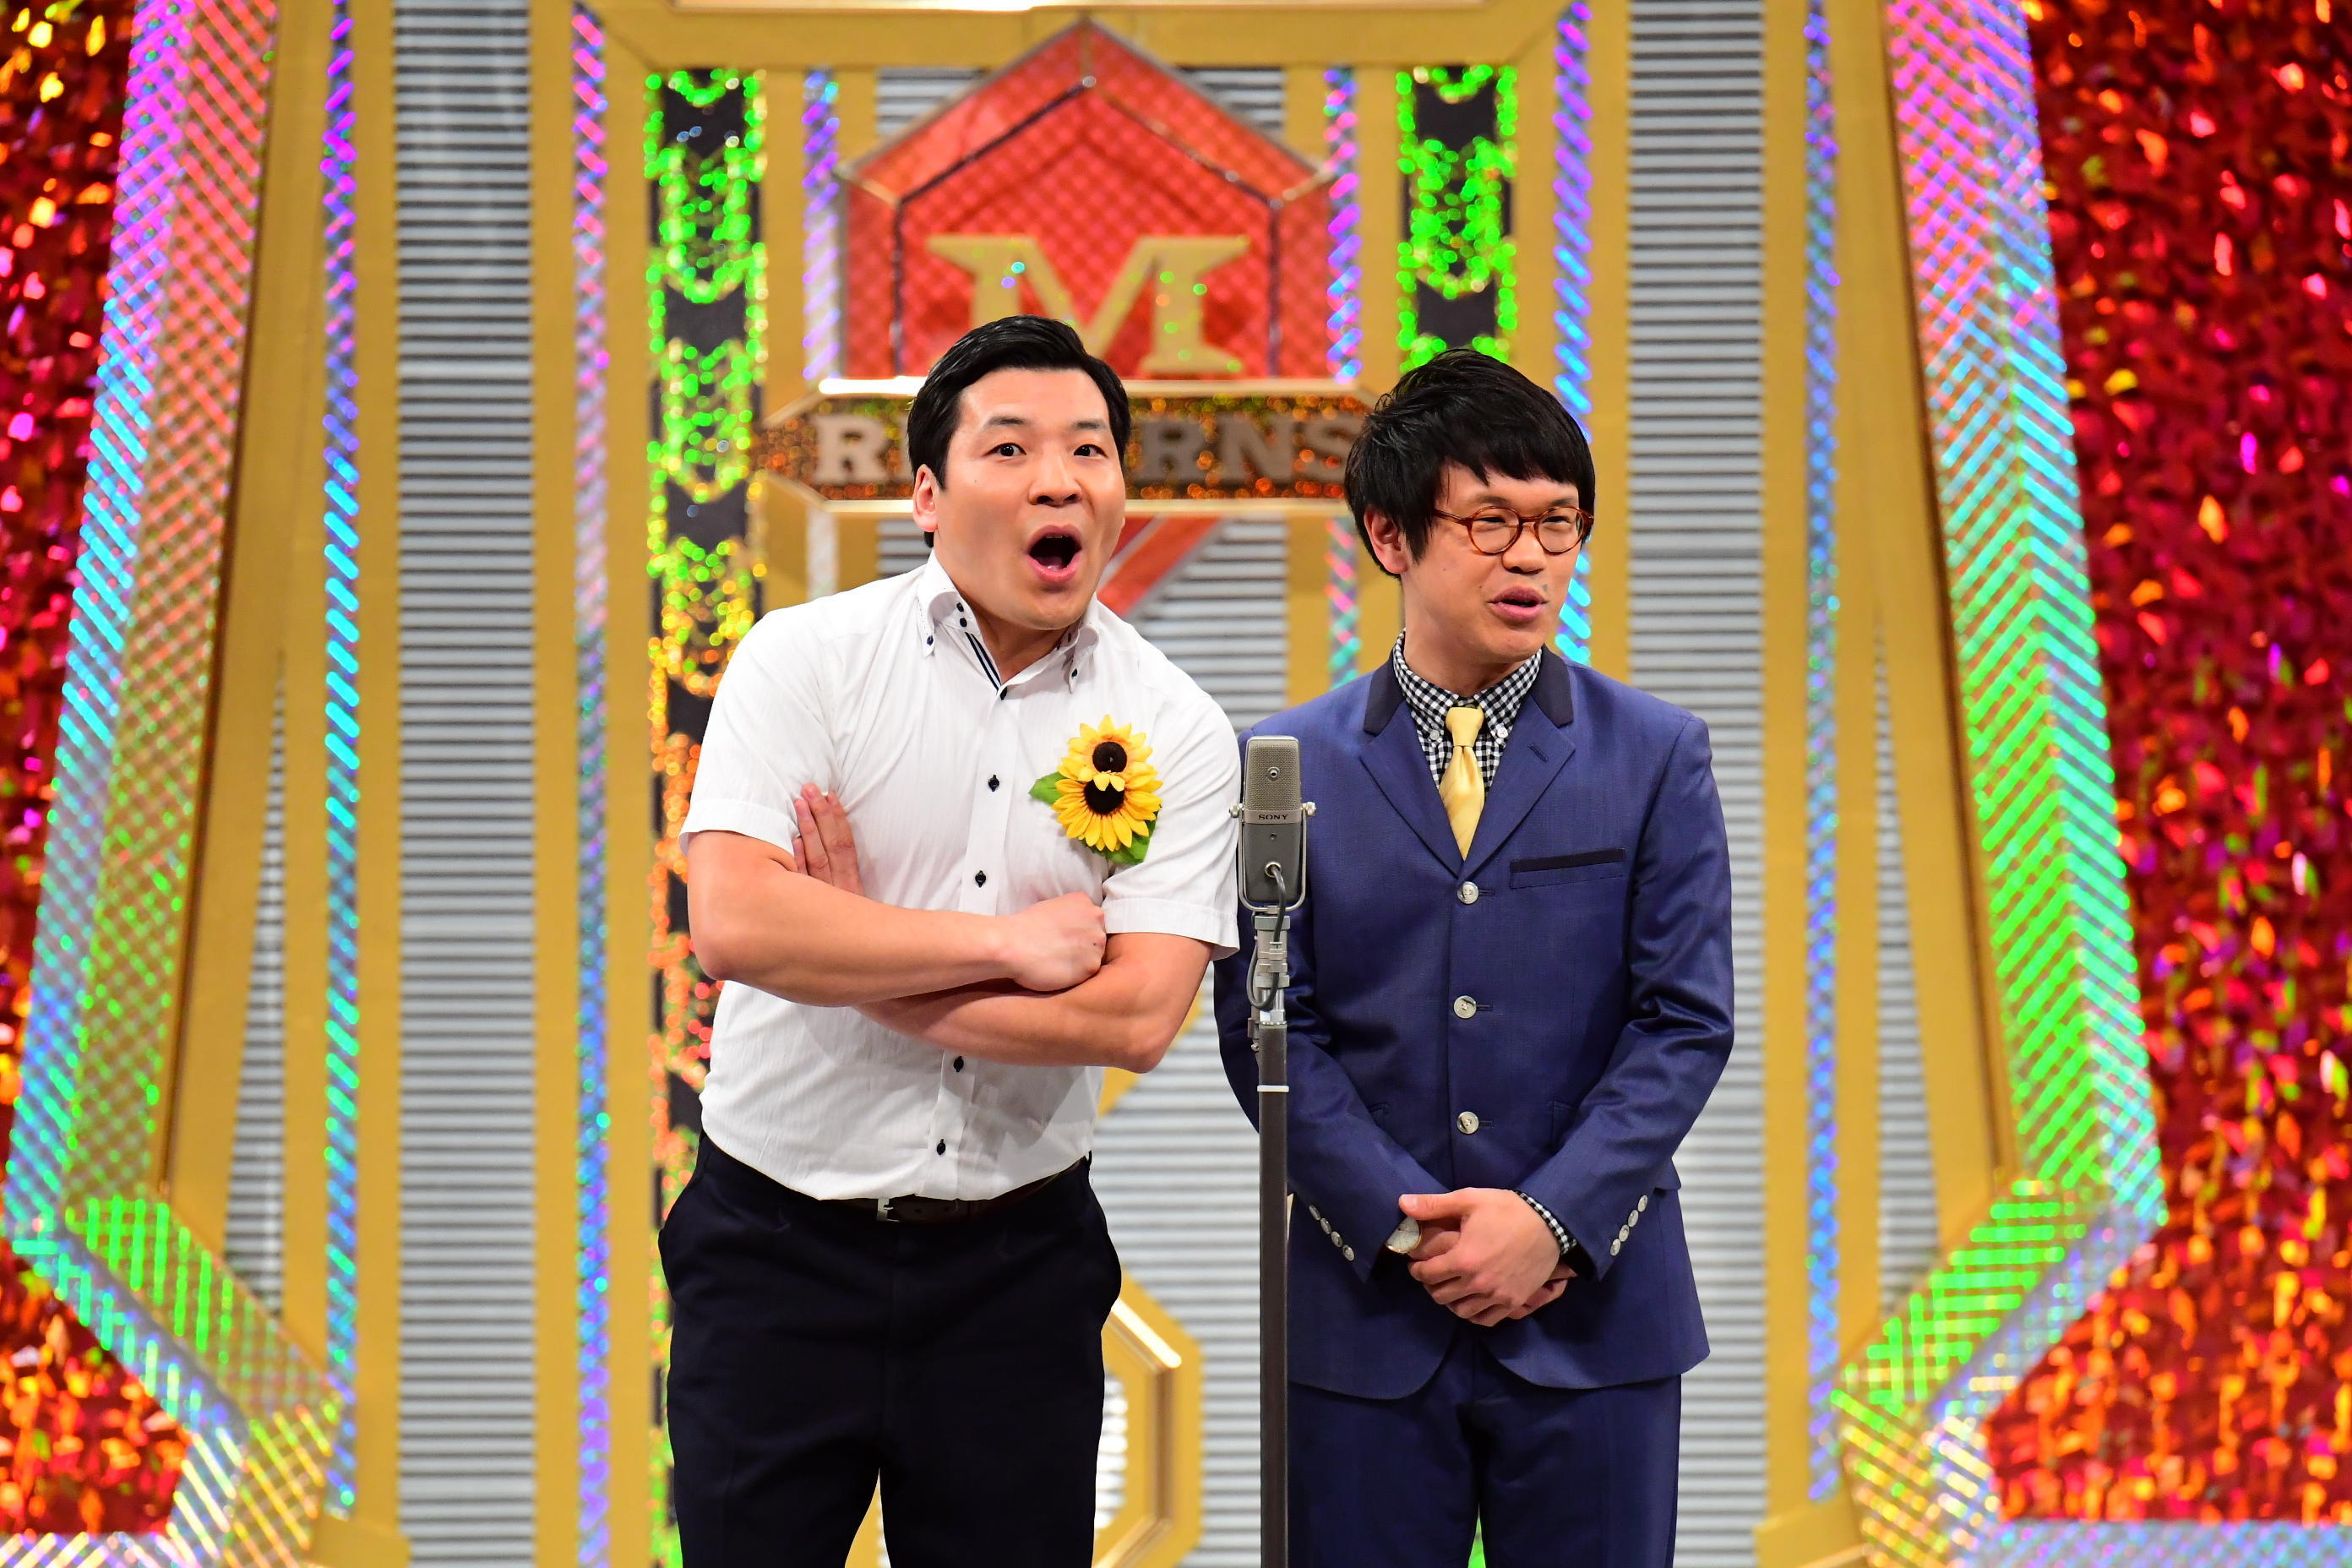 http://news.yoshimoto.co.jp/20170228155354-bb2deaa6b3d95e2cc83c6999ffb412c7a672508e.jpg